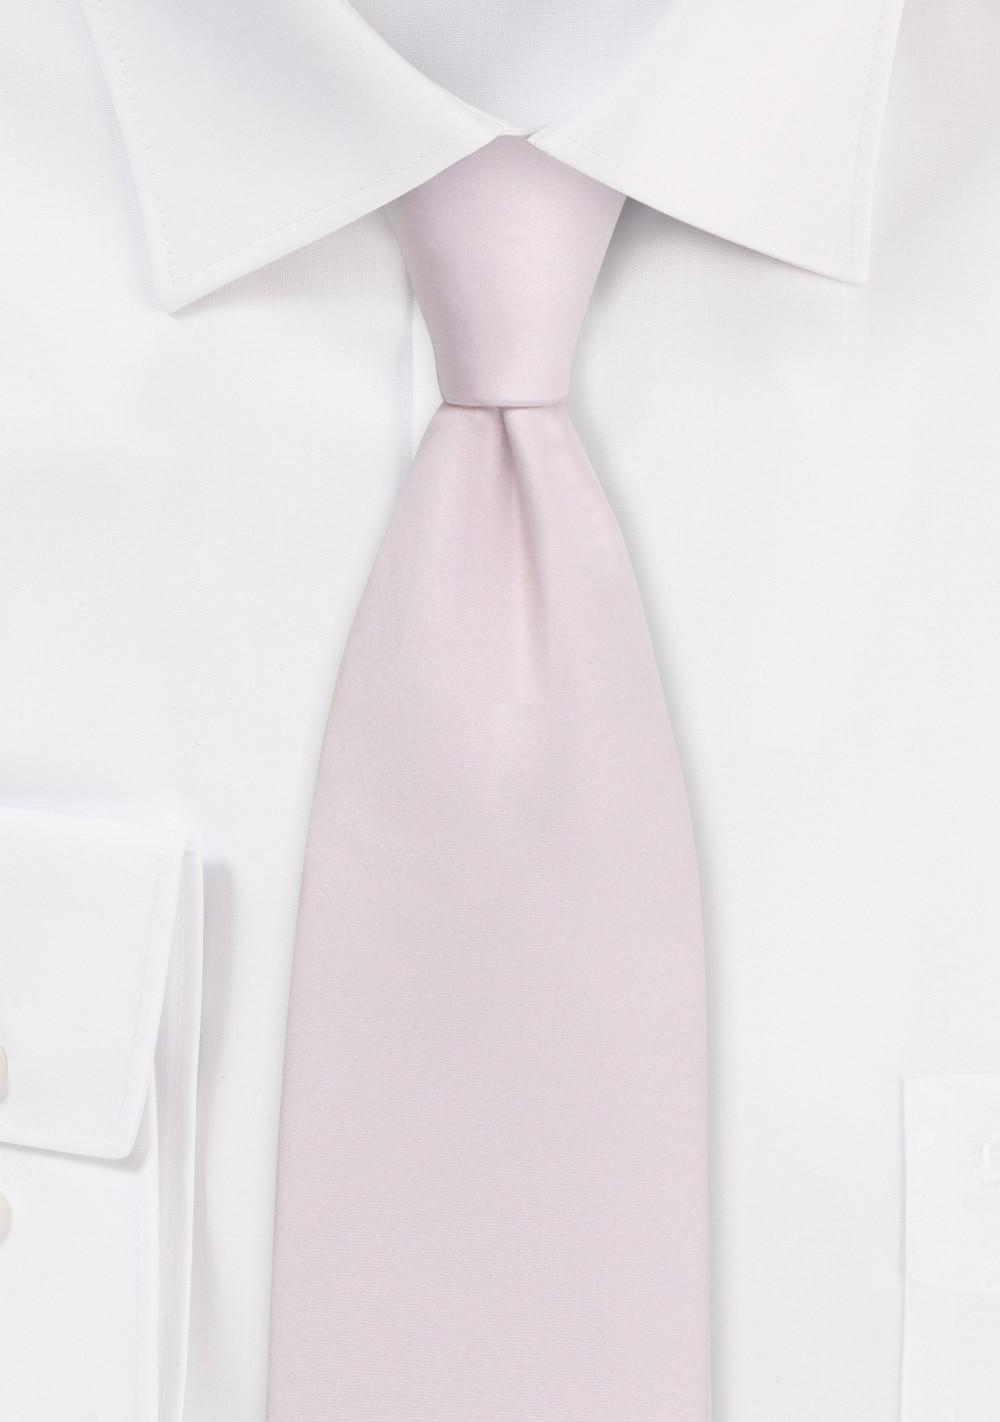 Solid Satin Tie in Blush Pink